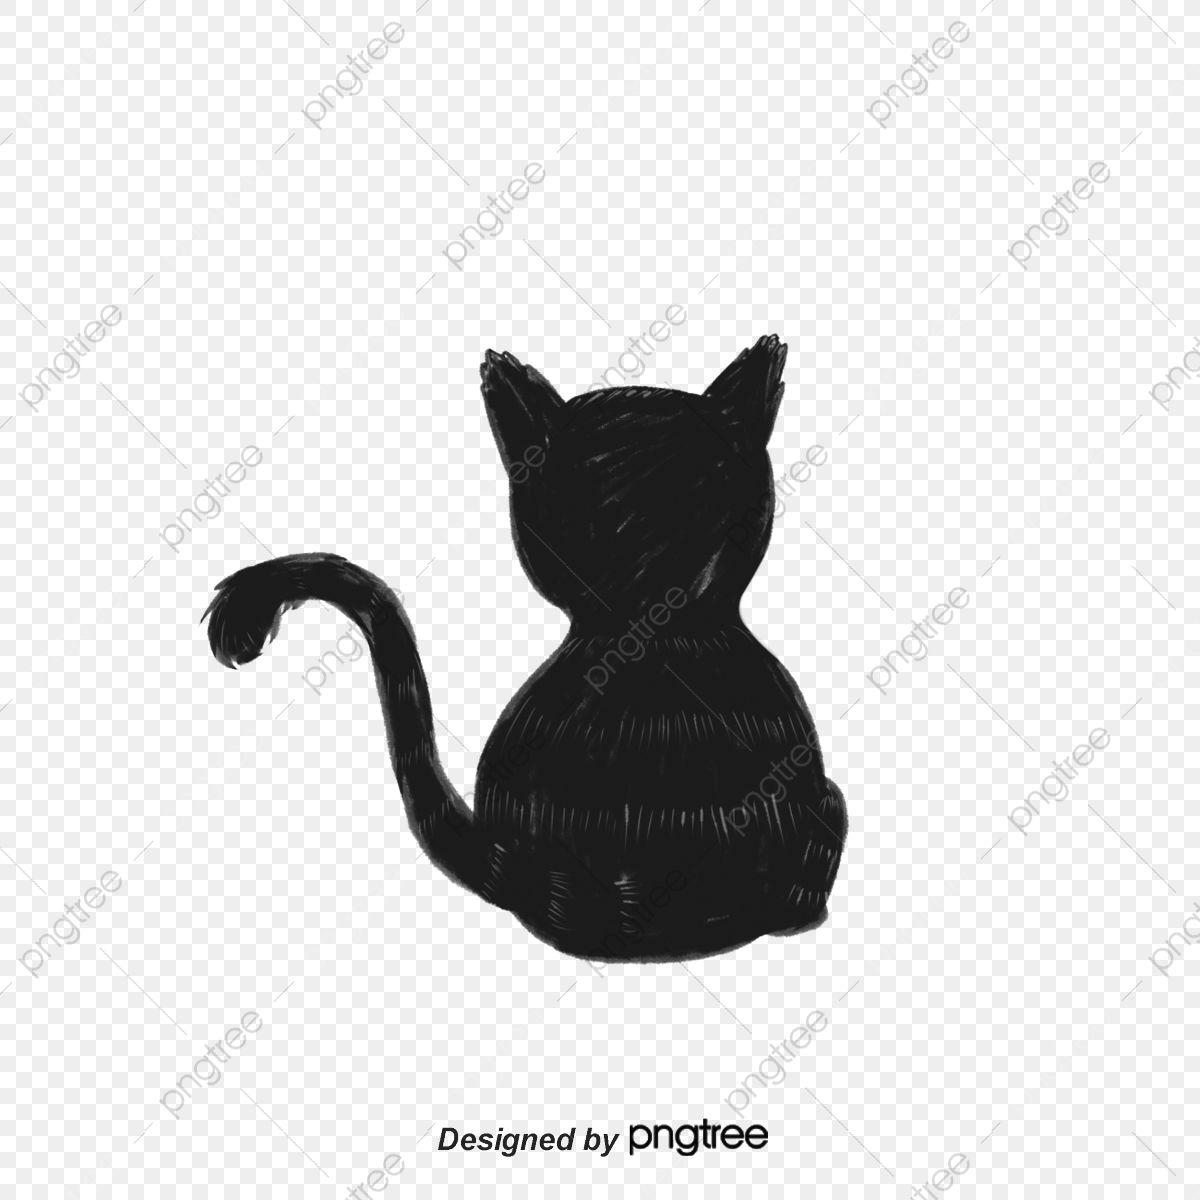 PNG Hitam, Anak Kucing, Haiwan, Siluet Haiwan Kucing Hitam Vektor ...